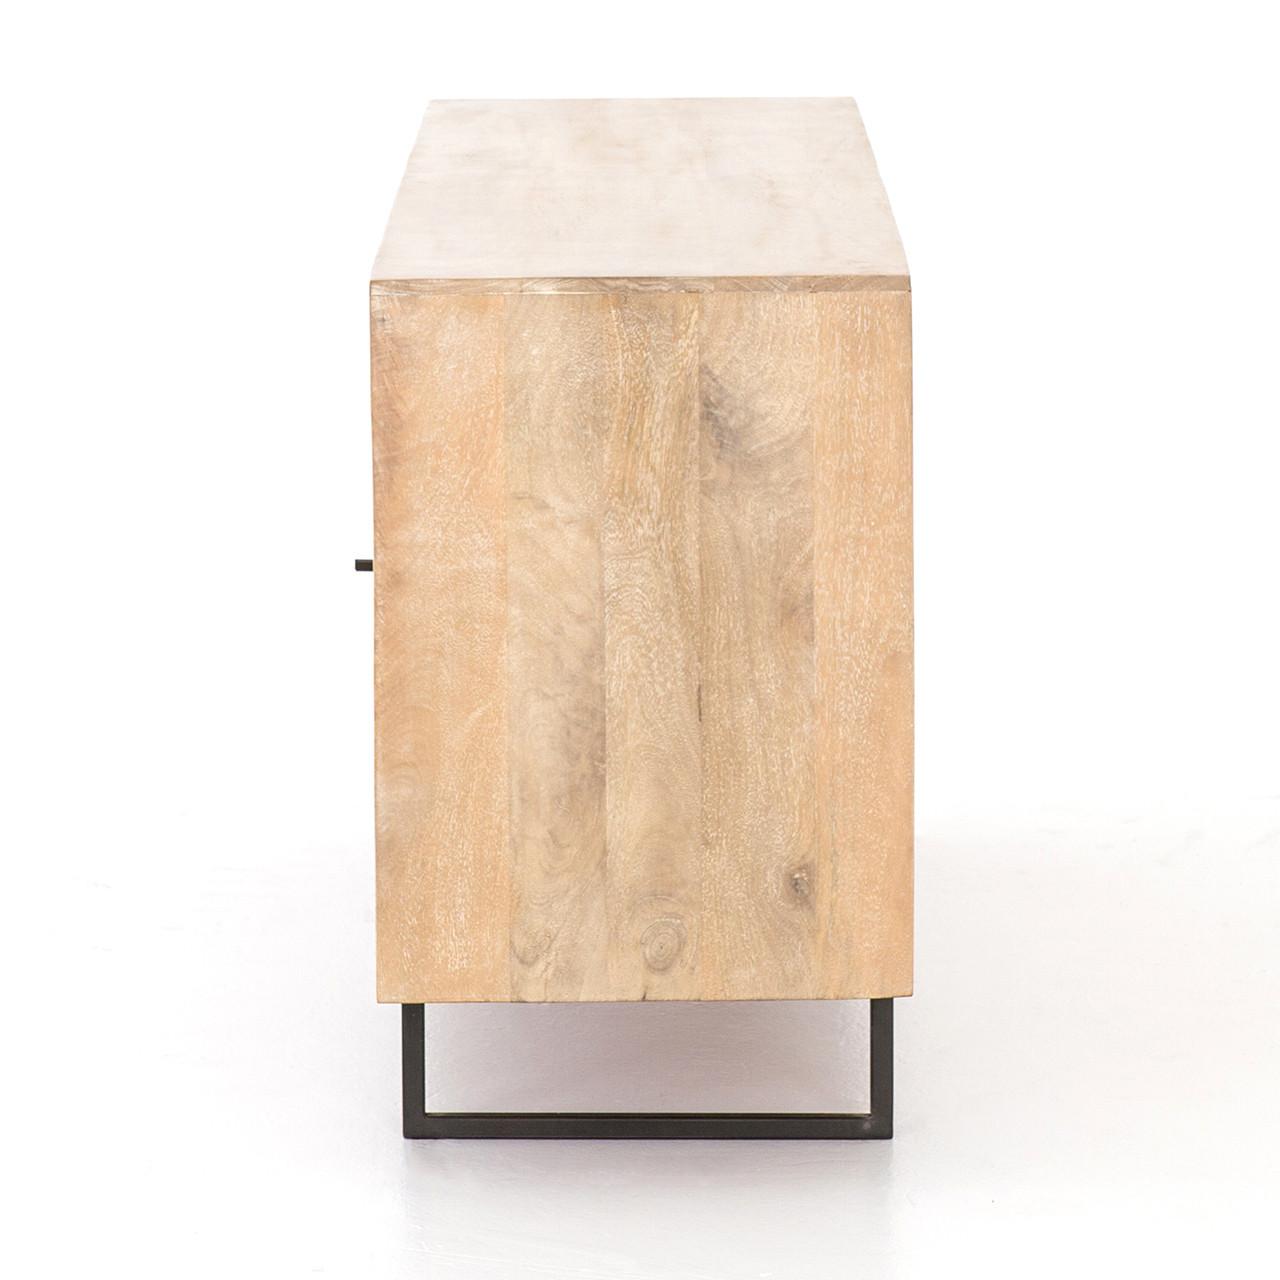 Bondi Cane Sideboard